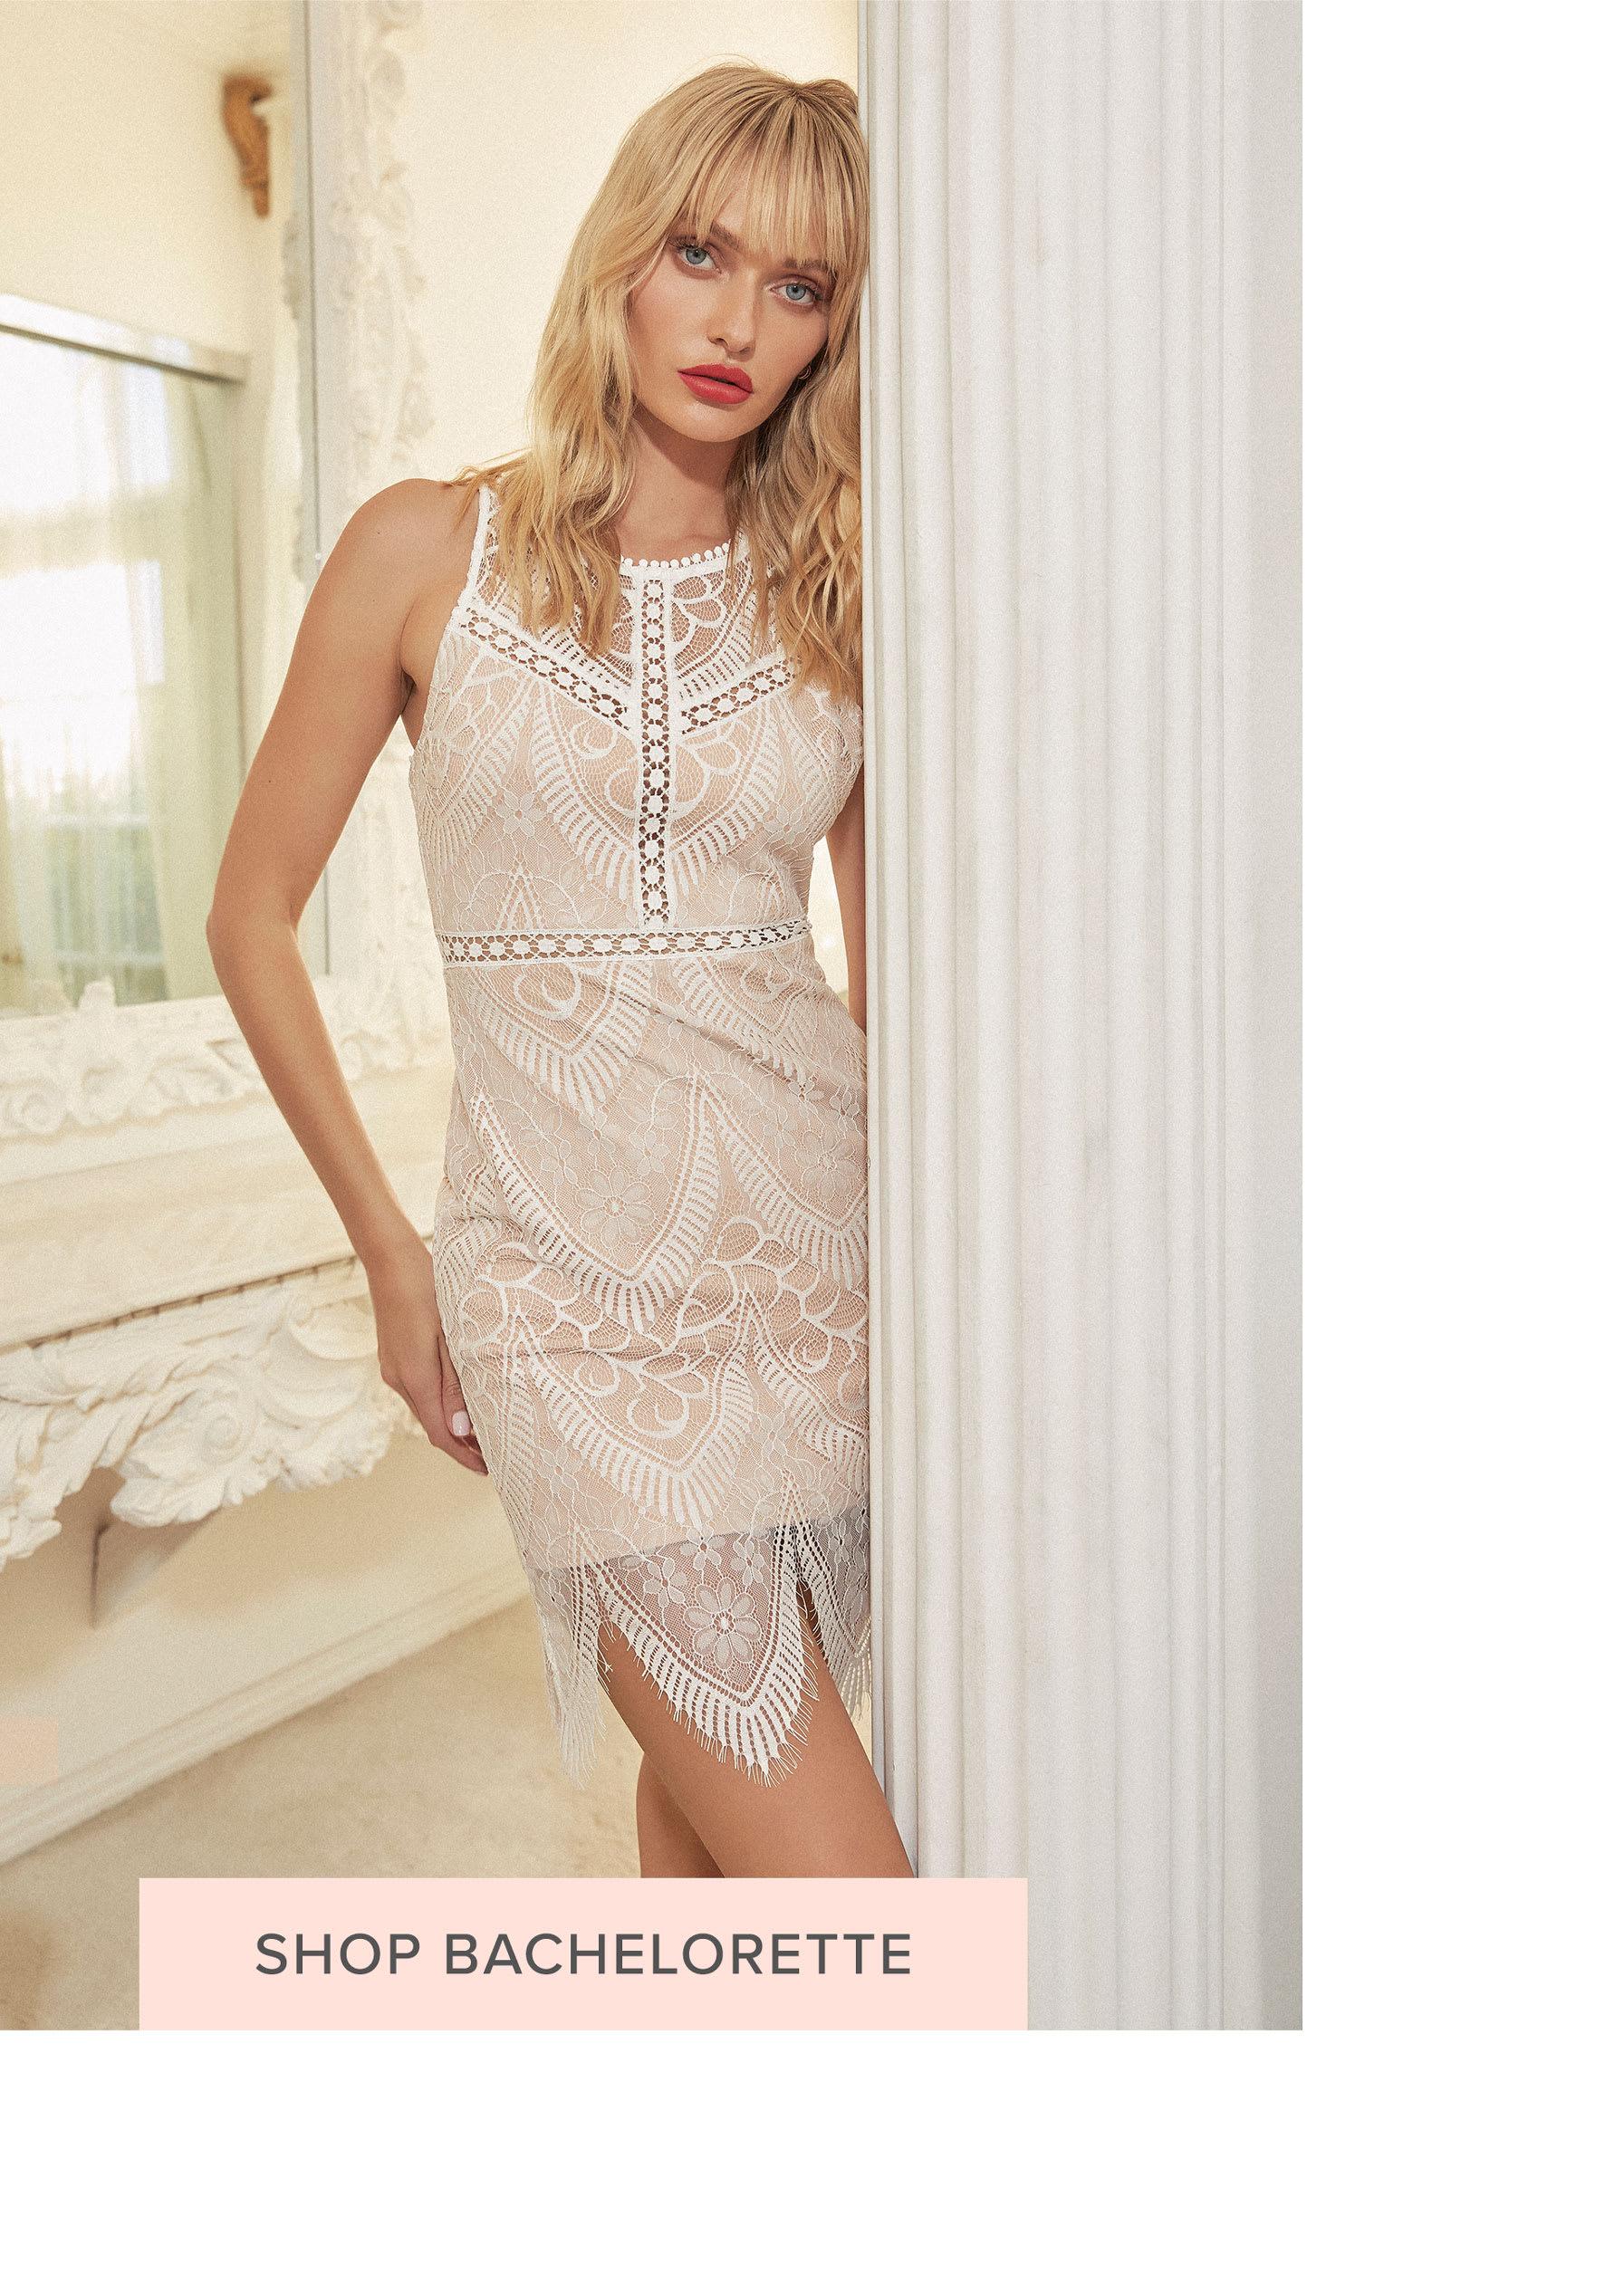 7abf5019fe women in satin and lacey lingerie set Shop Bridal Shower Dresses bride in  short white lace bachelorette party dress